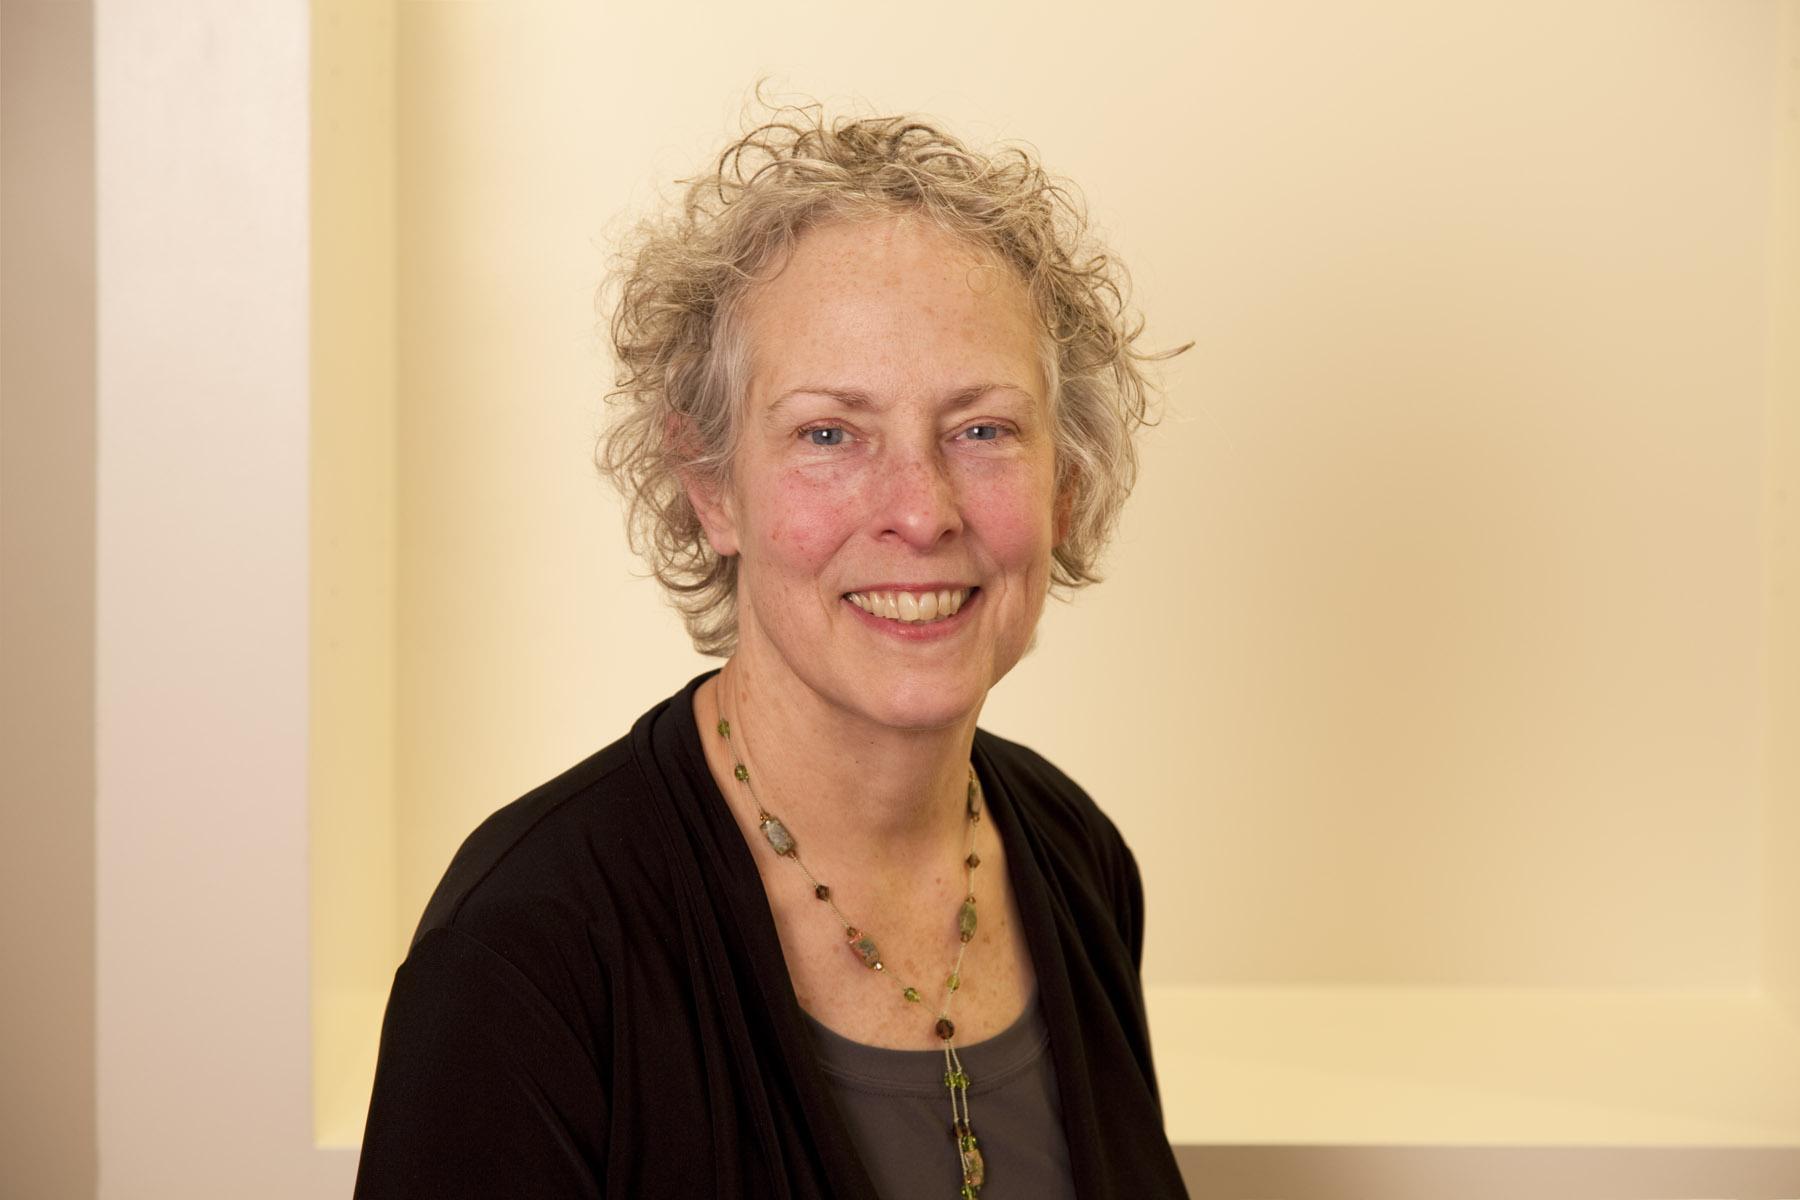 Suzanne Westbrook